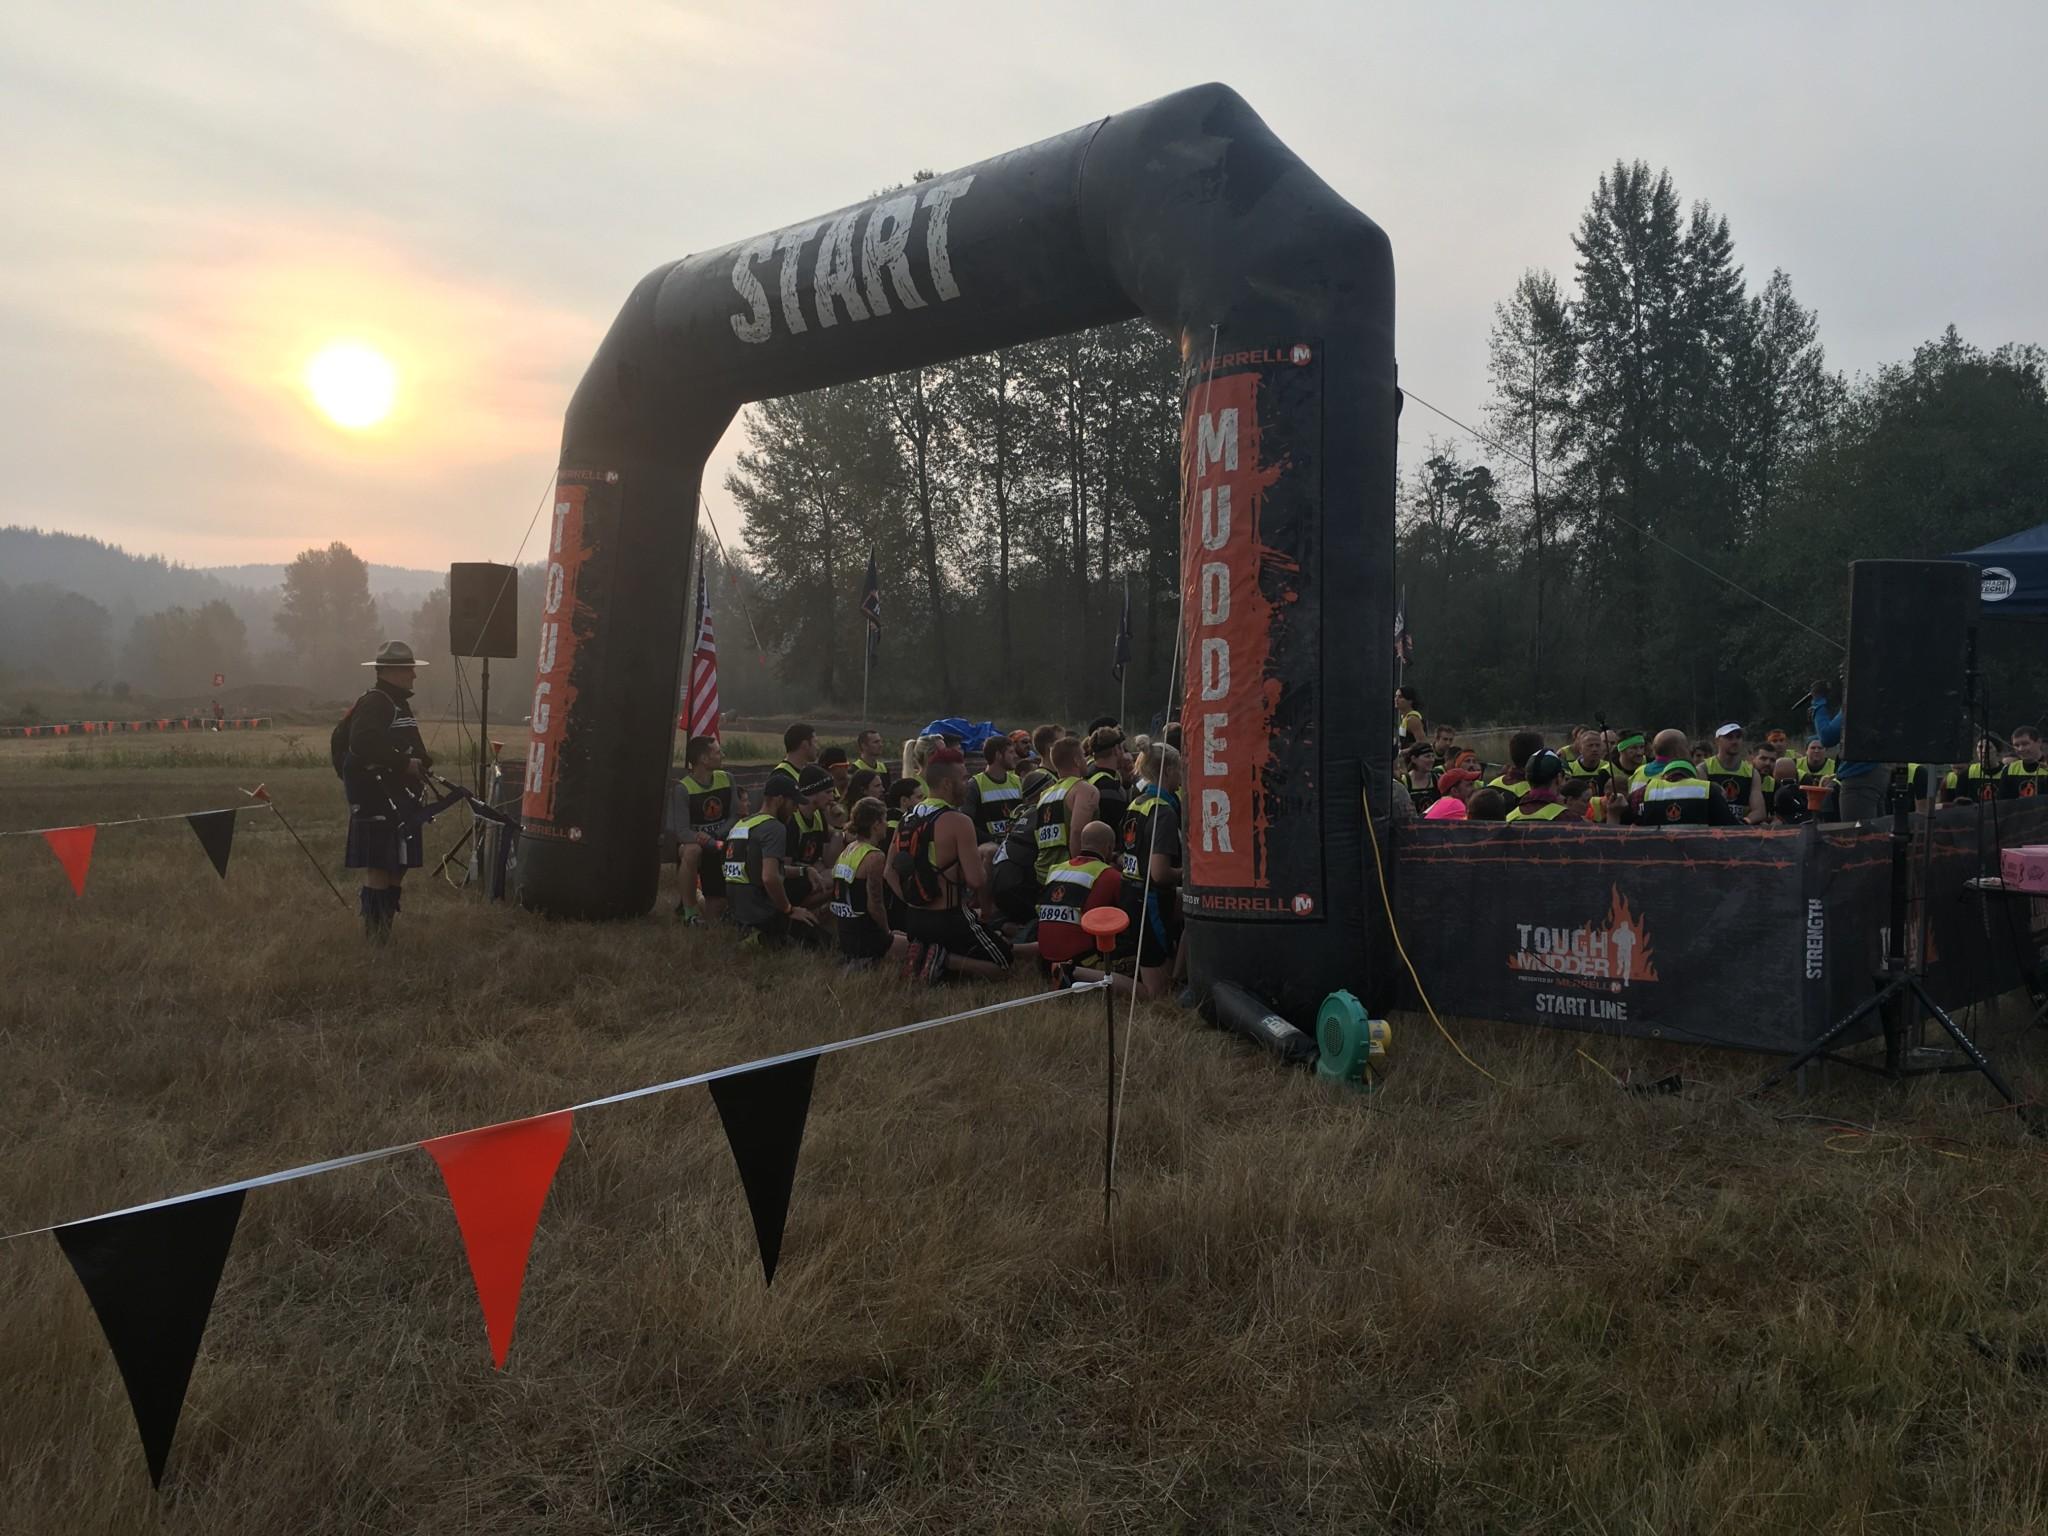 Tough-Mudder-Seattle-2017-Start-Line